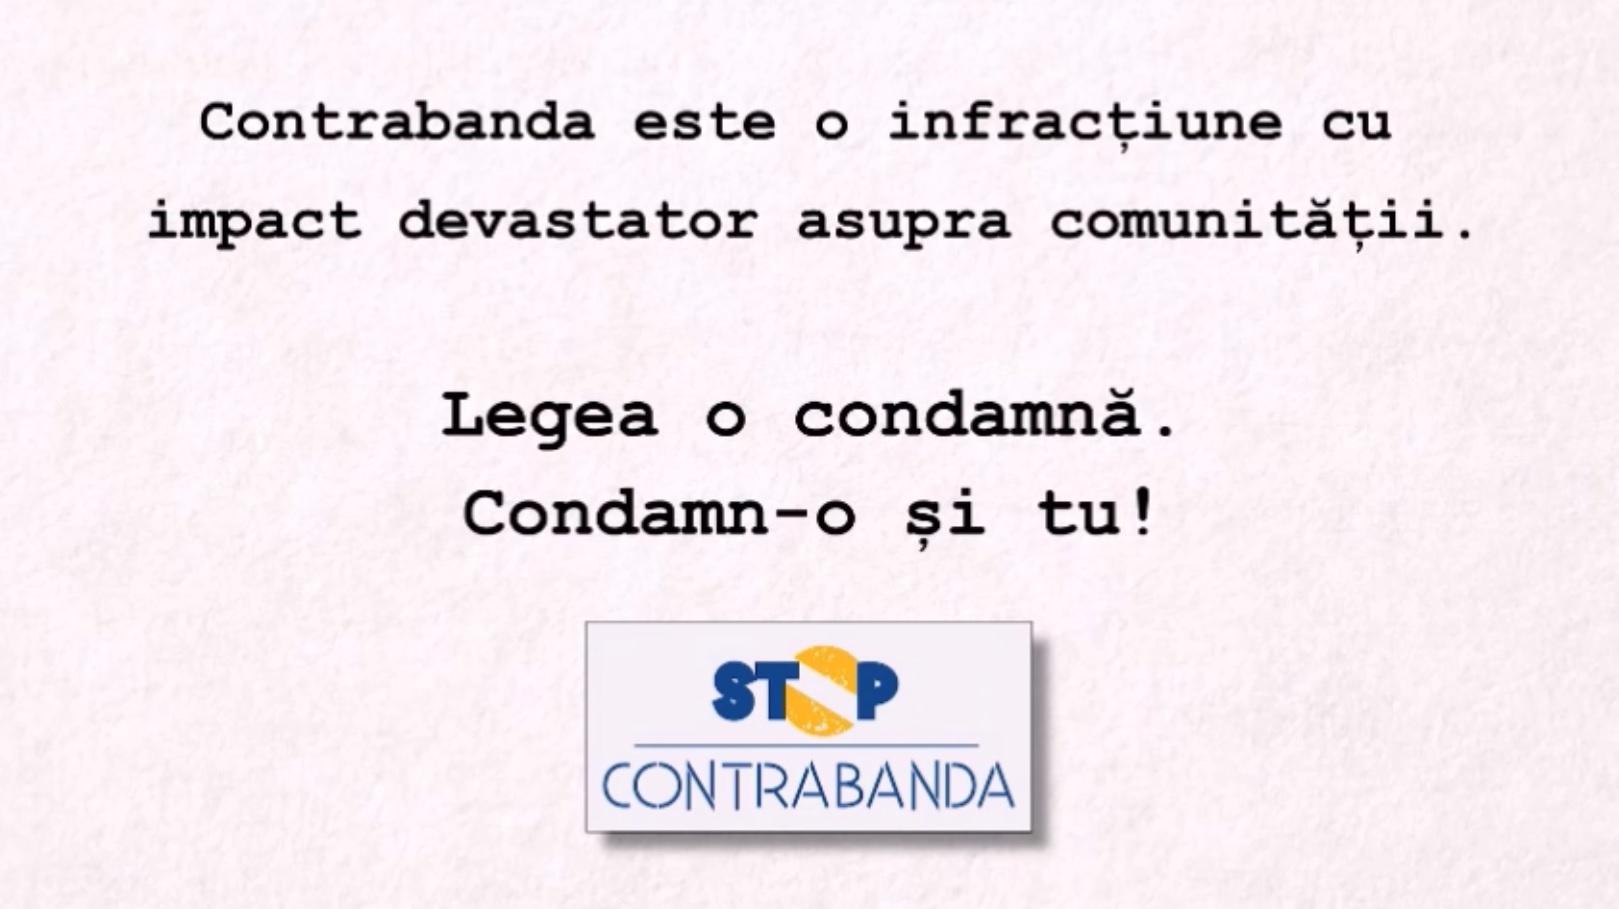 stop contrabanda